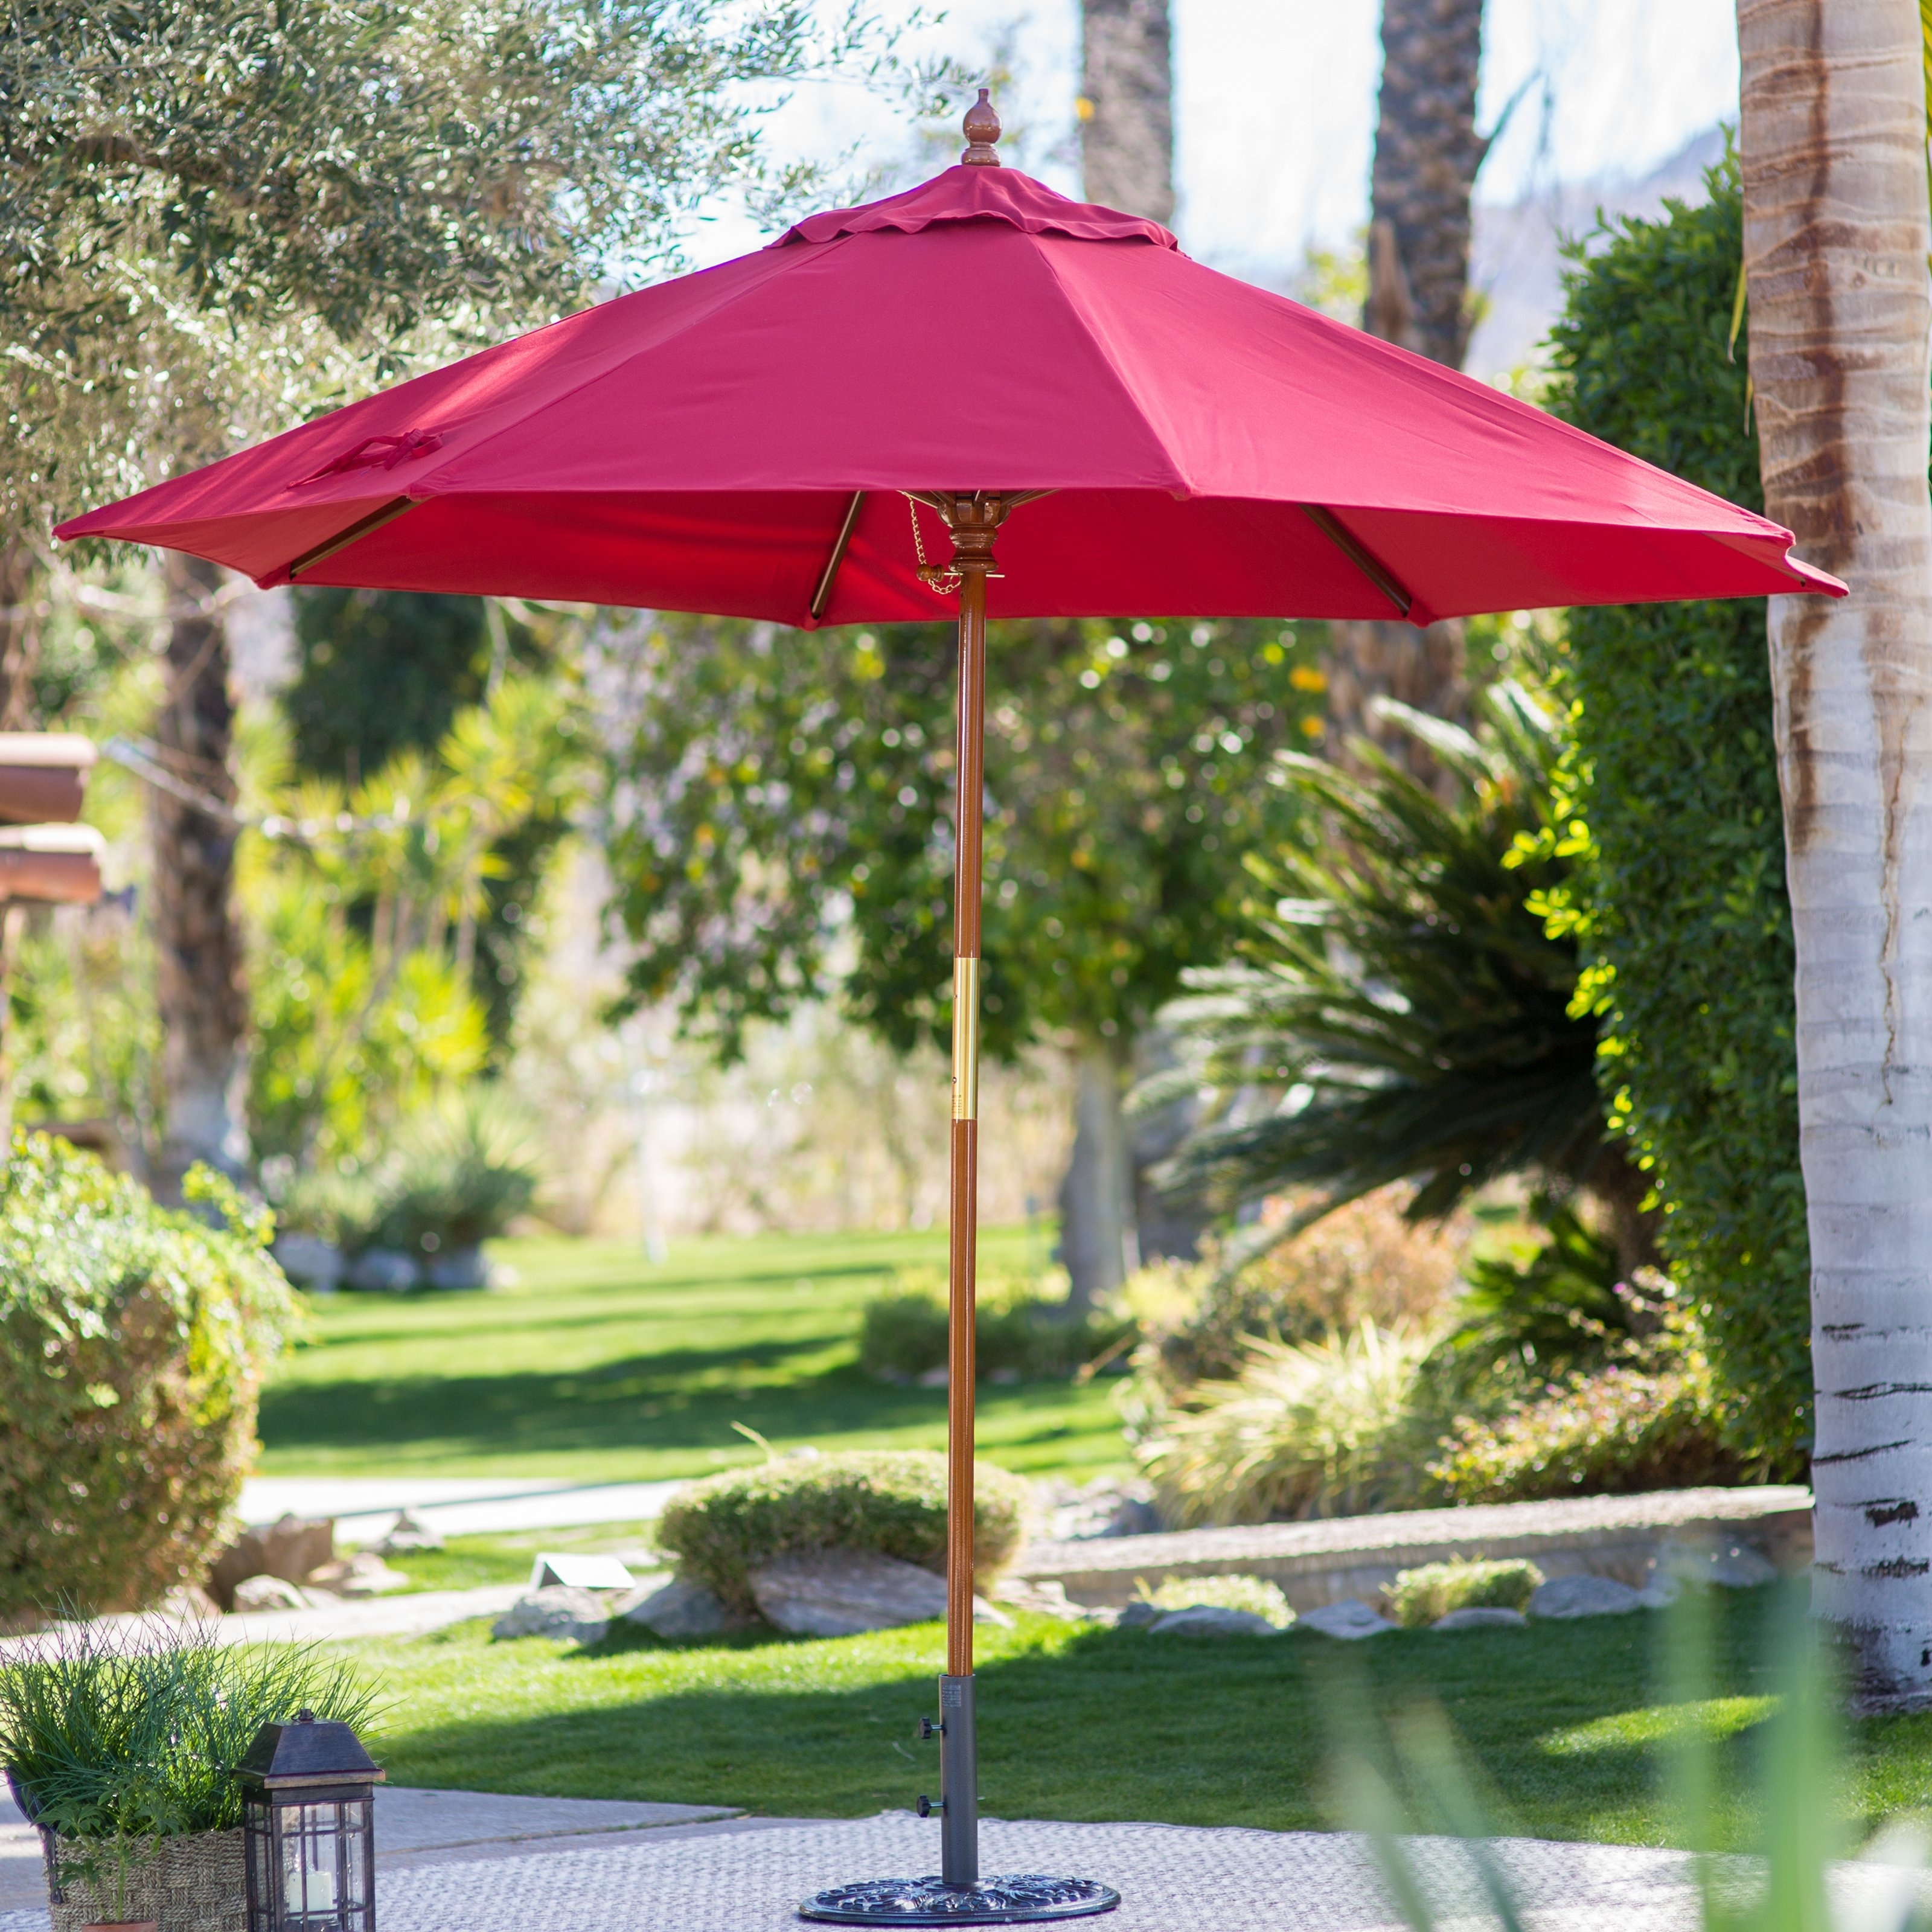 Sunbrella Patio Umbrellas Inside Best And Newest Belham Living  (View 15 of 20)